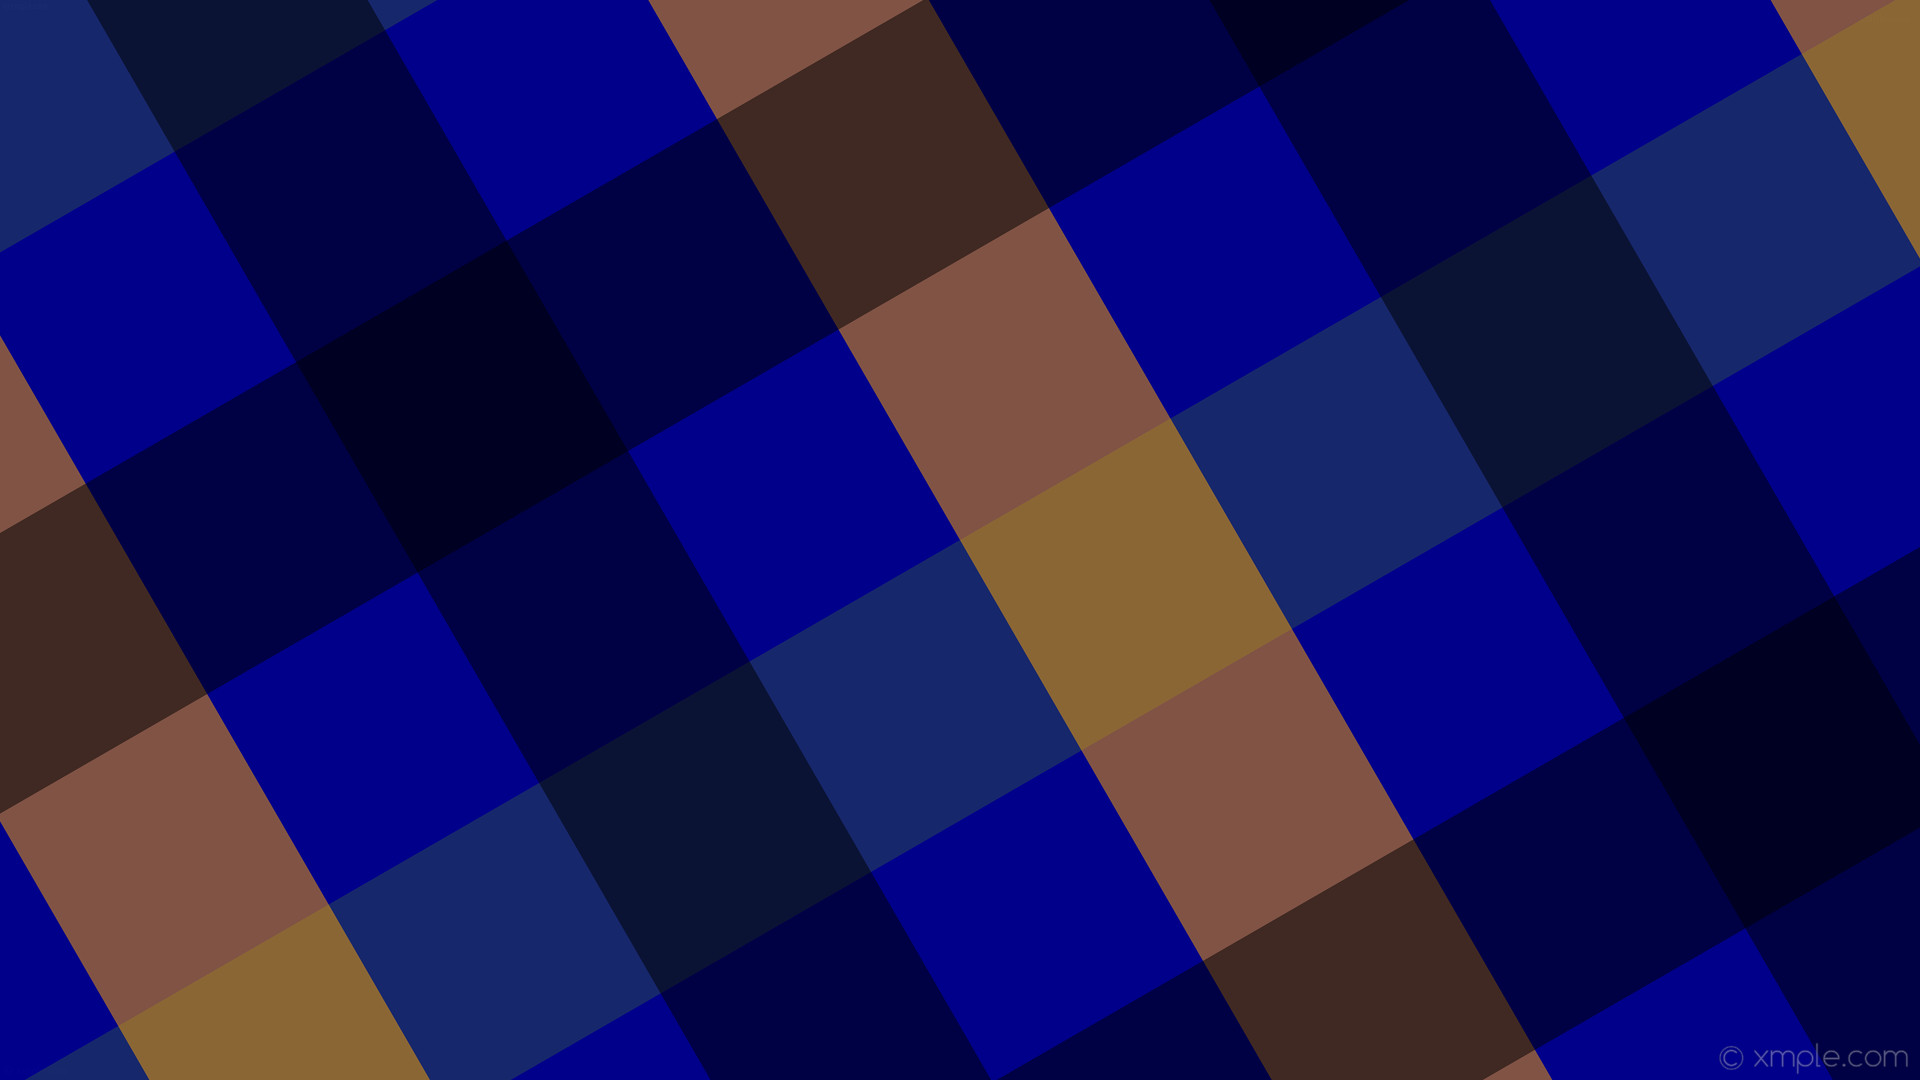 wallpaper orange striped blue grey quad gingham black dark blue dark slate  gray #00008b #